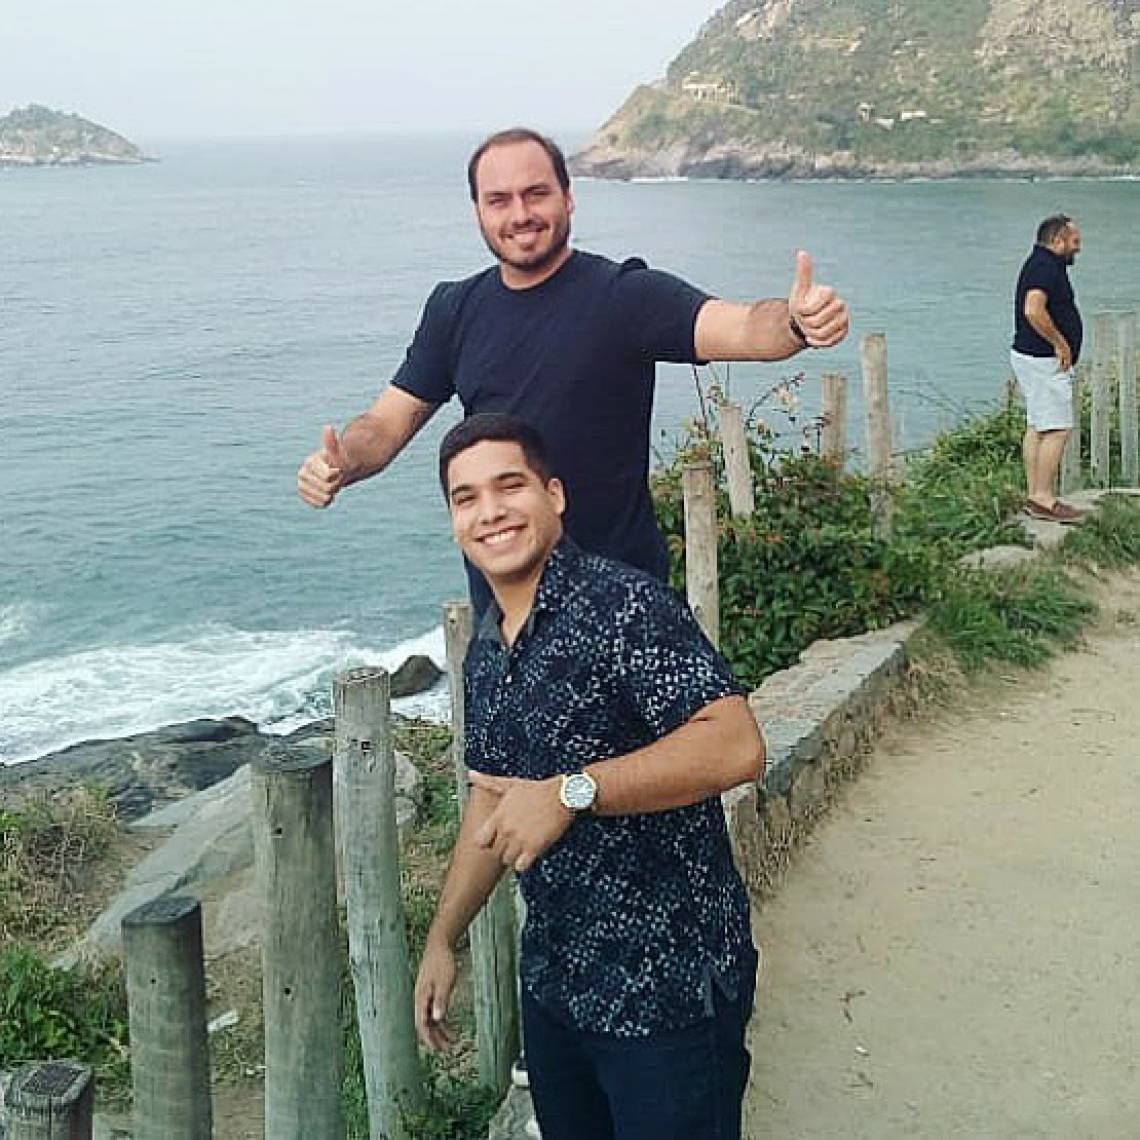 Deputado André Fernandes e vereador do Rio Carlos Bolsonaro